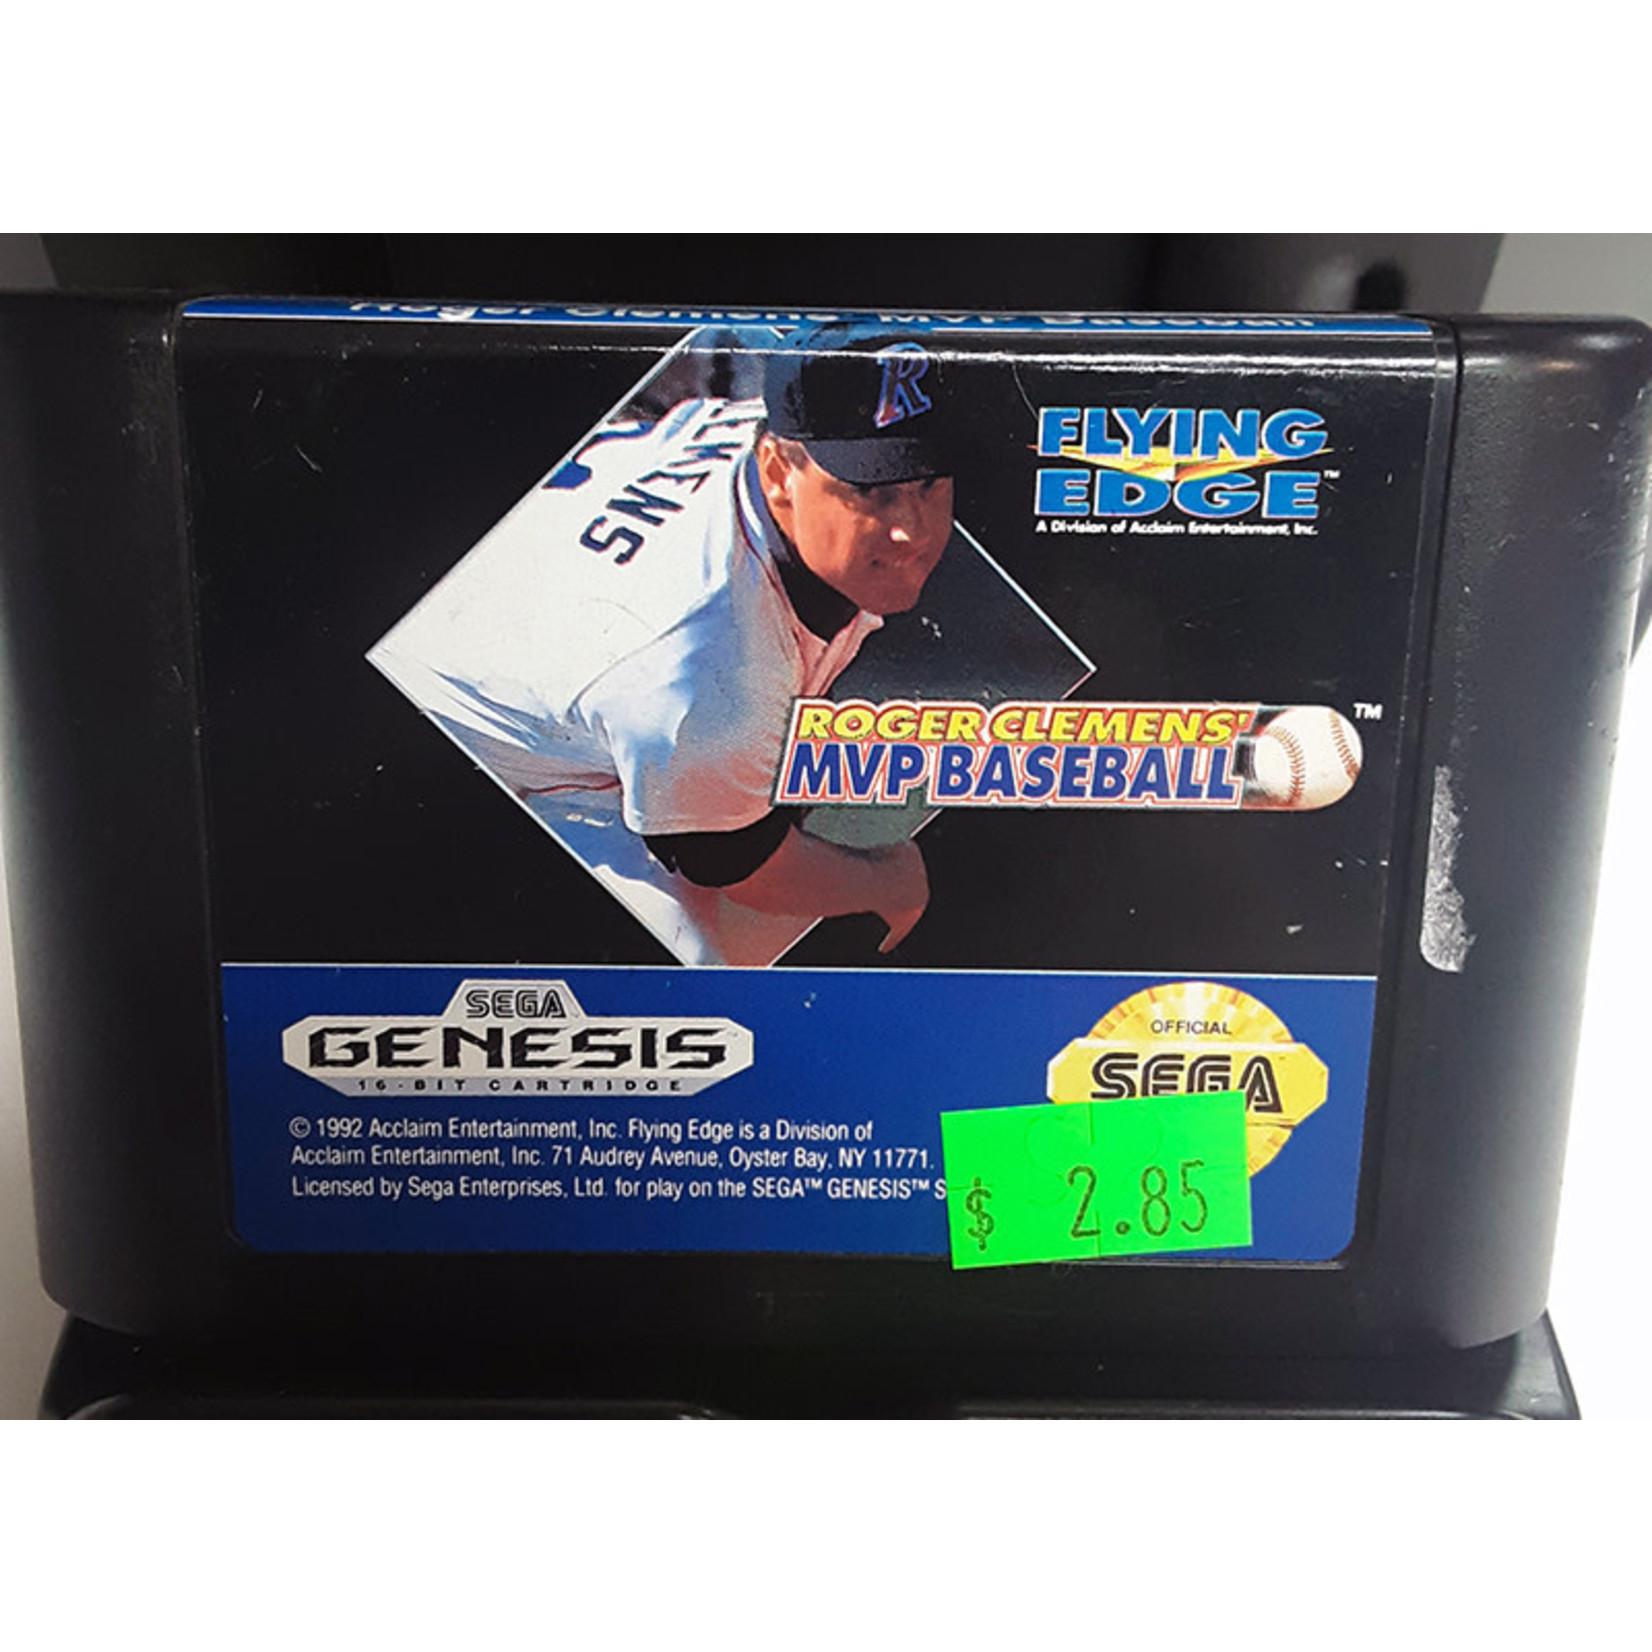 sgu-Roger Clemens' MVP Baseball (cartridge)